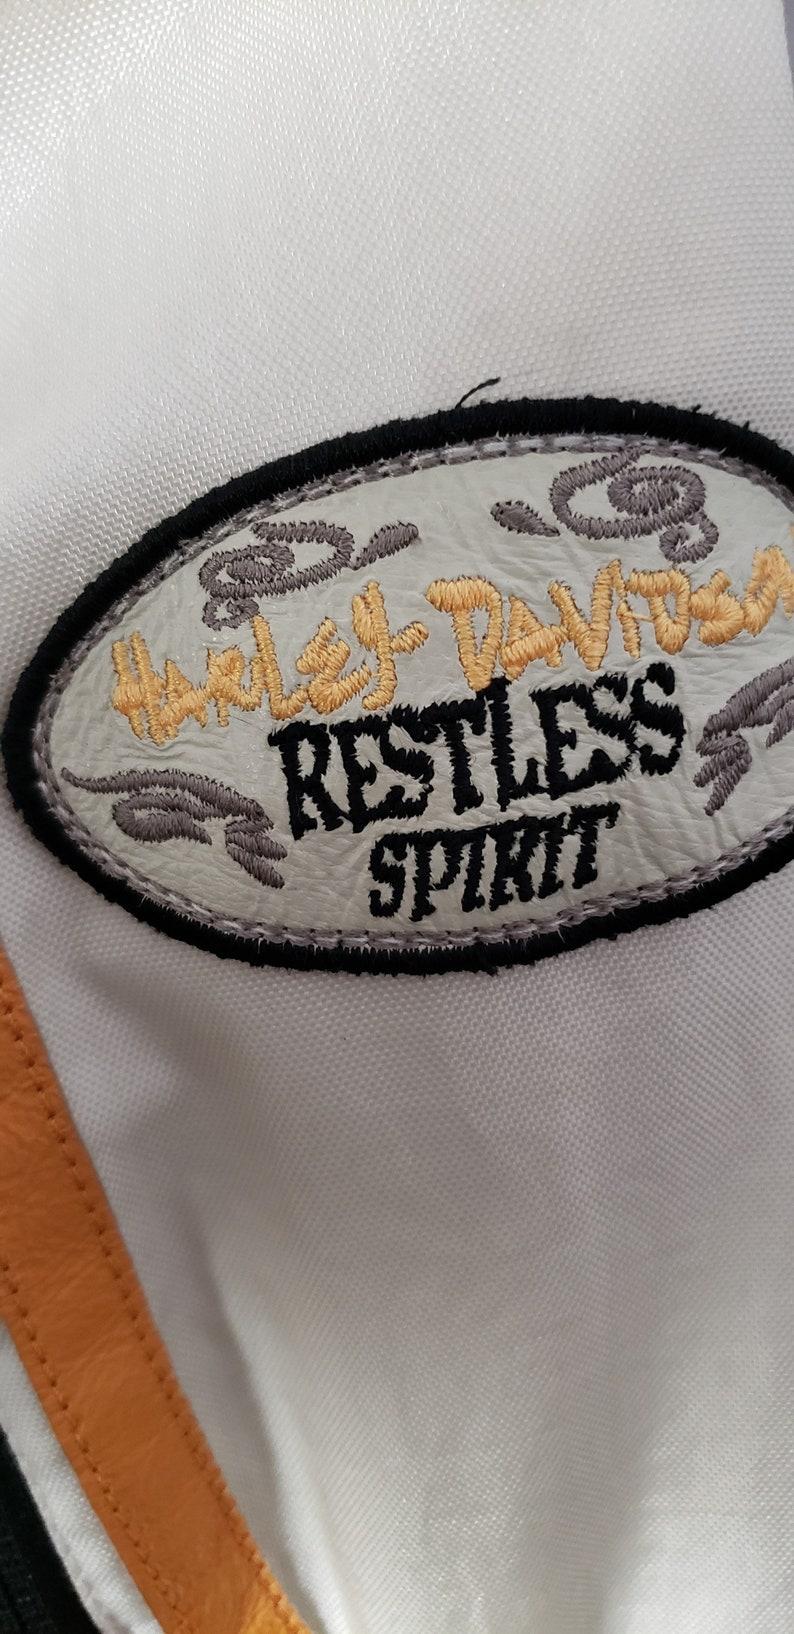 Harley Davidson Riding Jacket Women\u2019s embroidered off-white coat size small